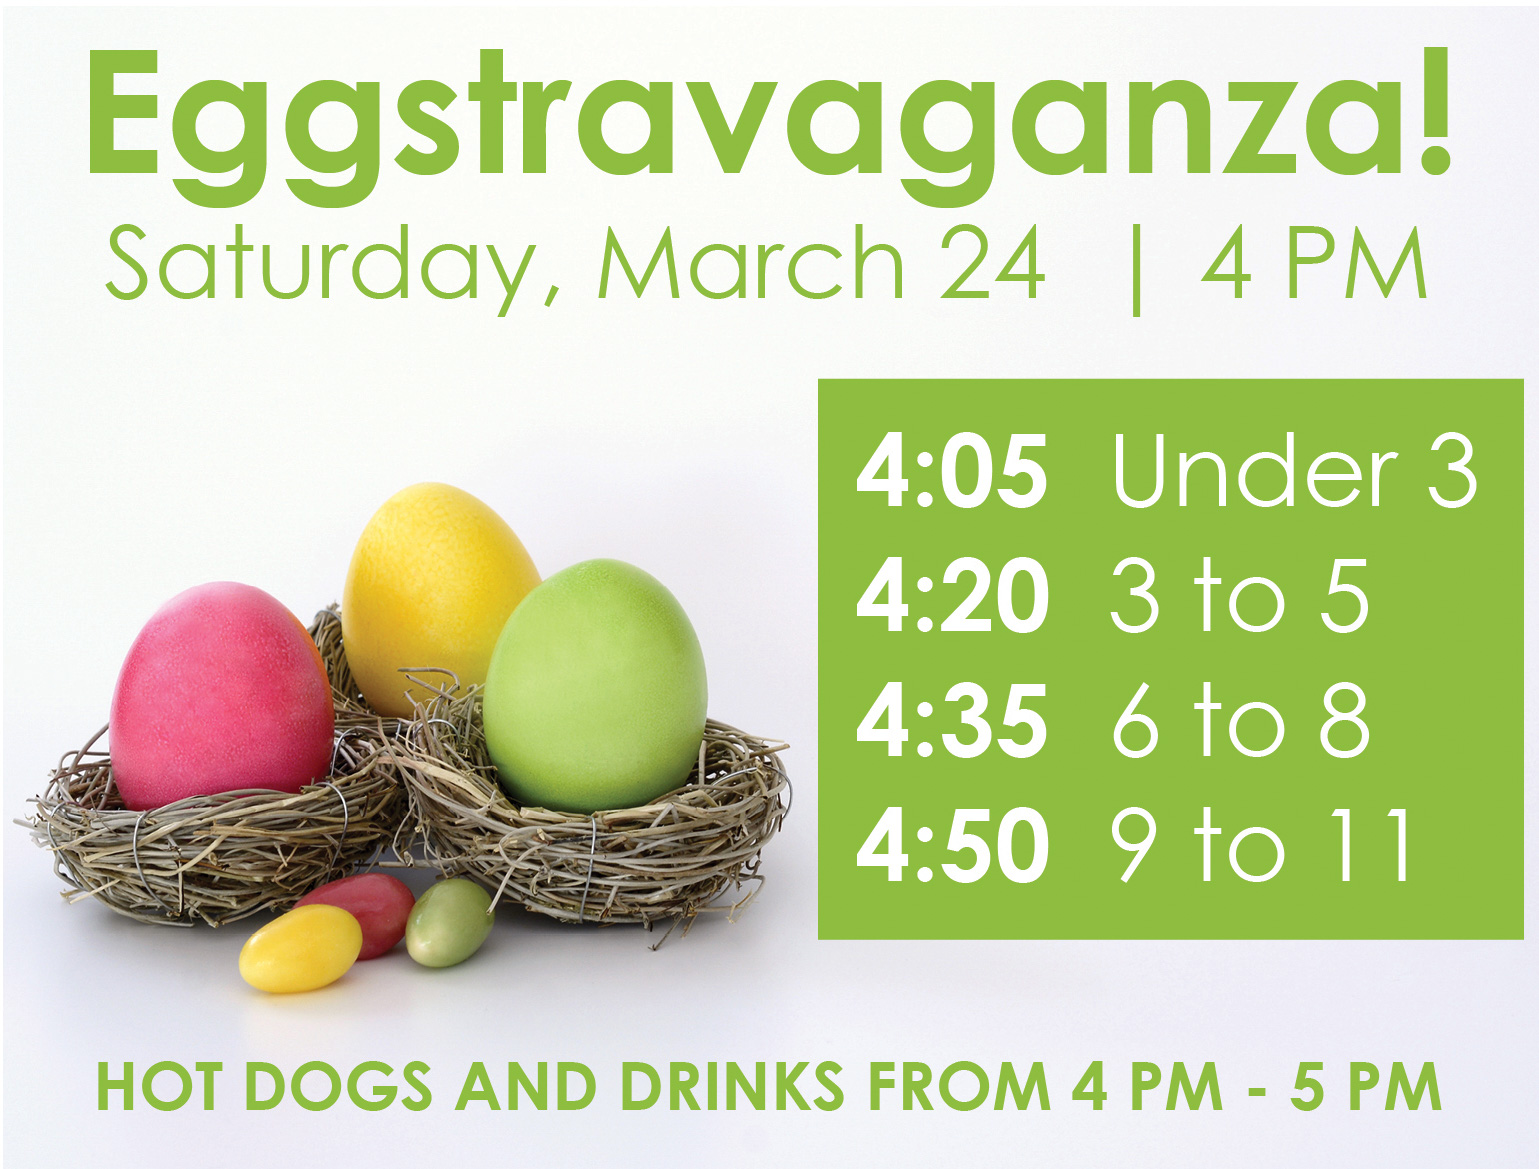 Easter eggstravaganza johns creek umc easter eggstravaganza negle Gallery